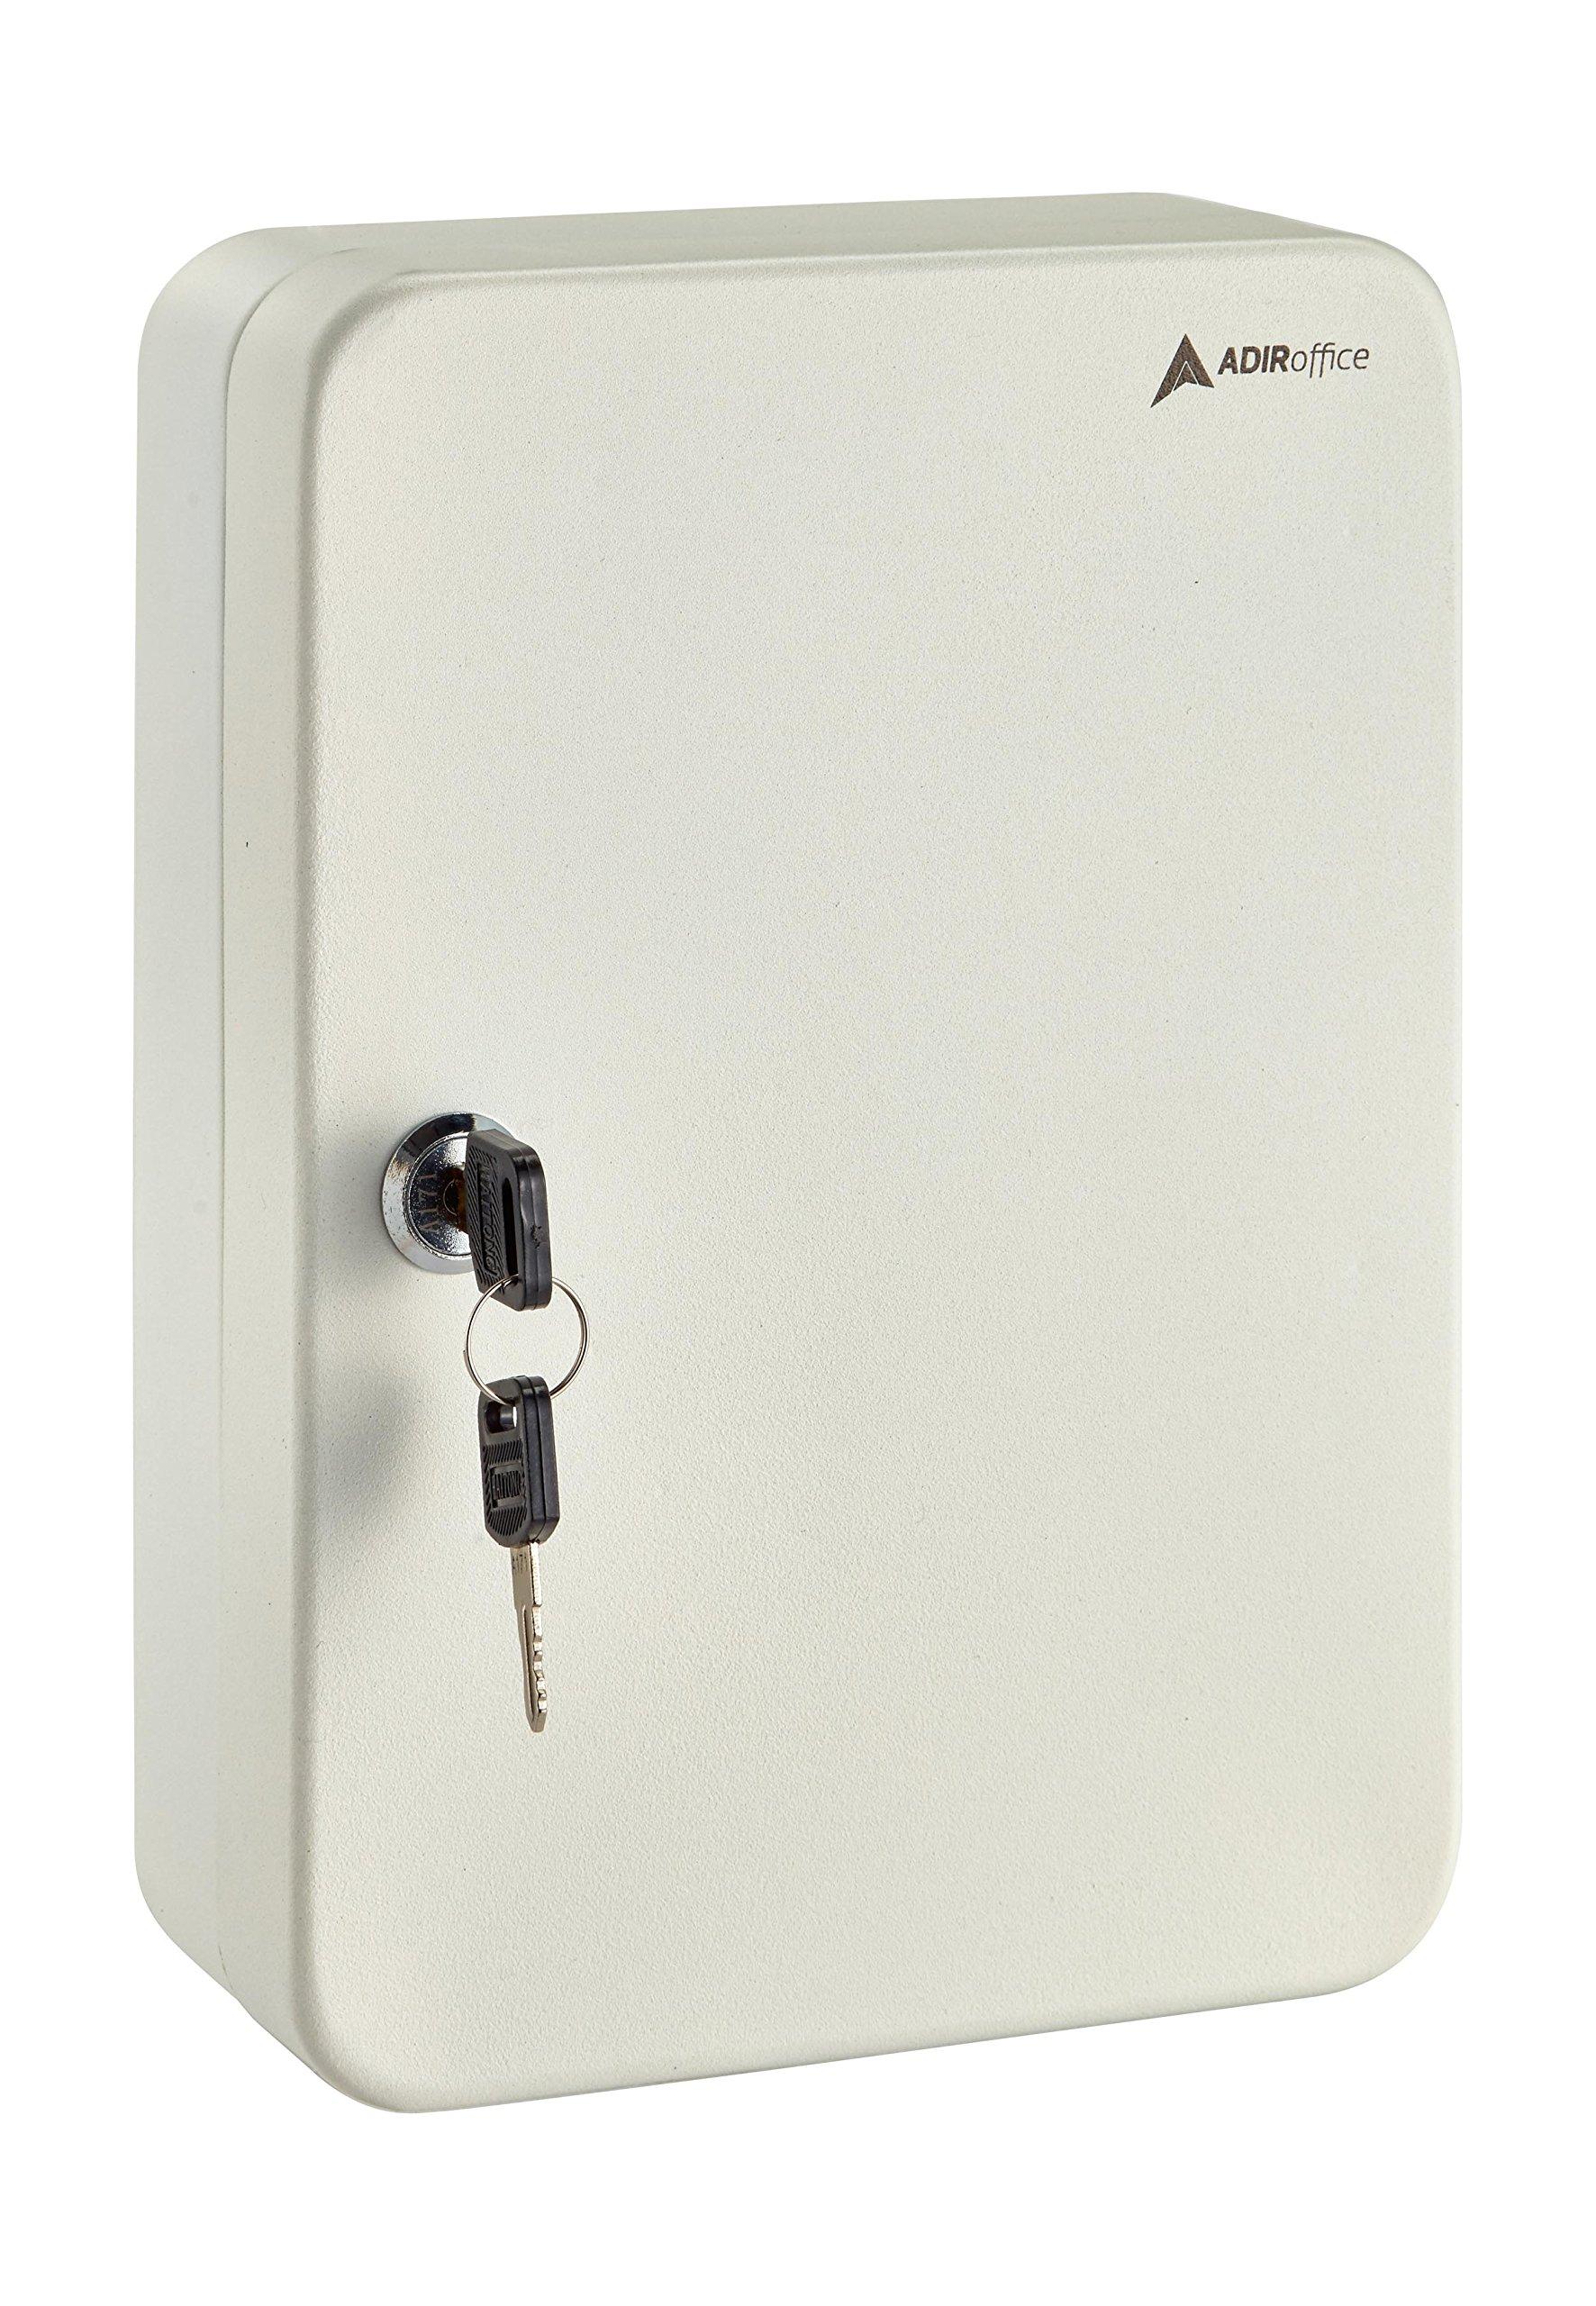 AdirOffice Key Steel Security Storage Holder Cabinet Valet Lock Box (48 Key, White)